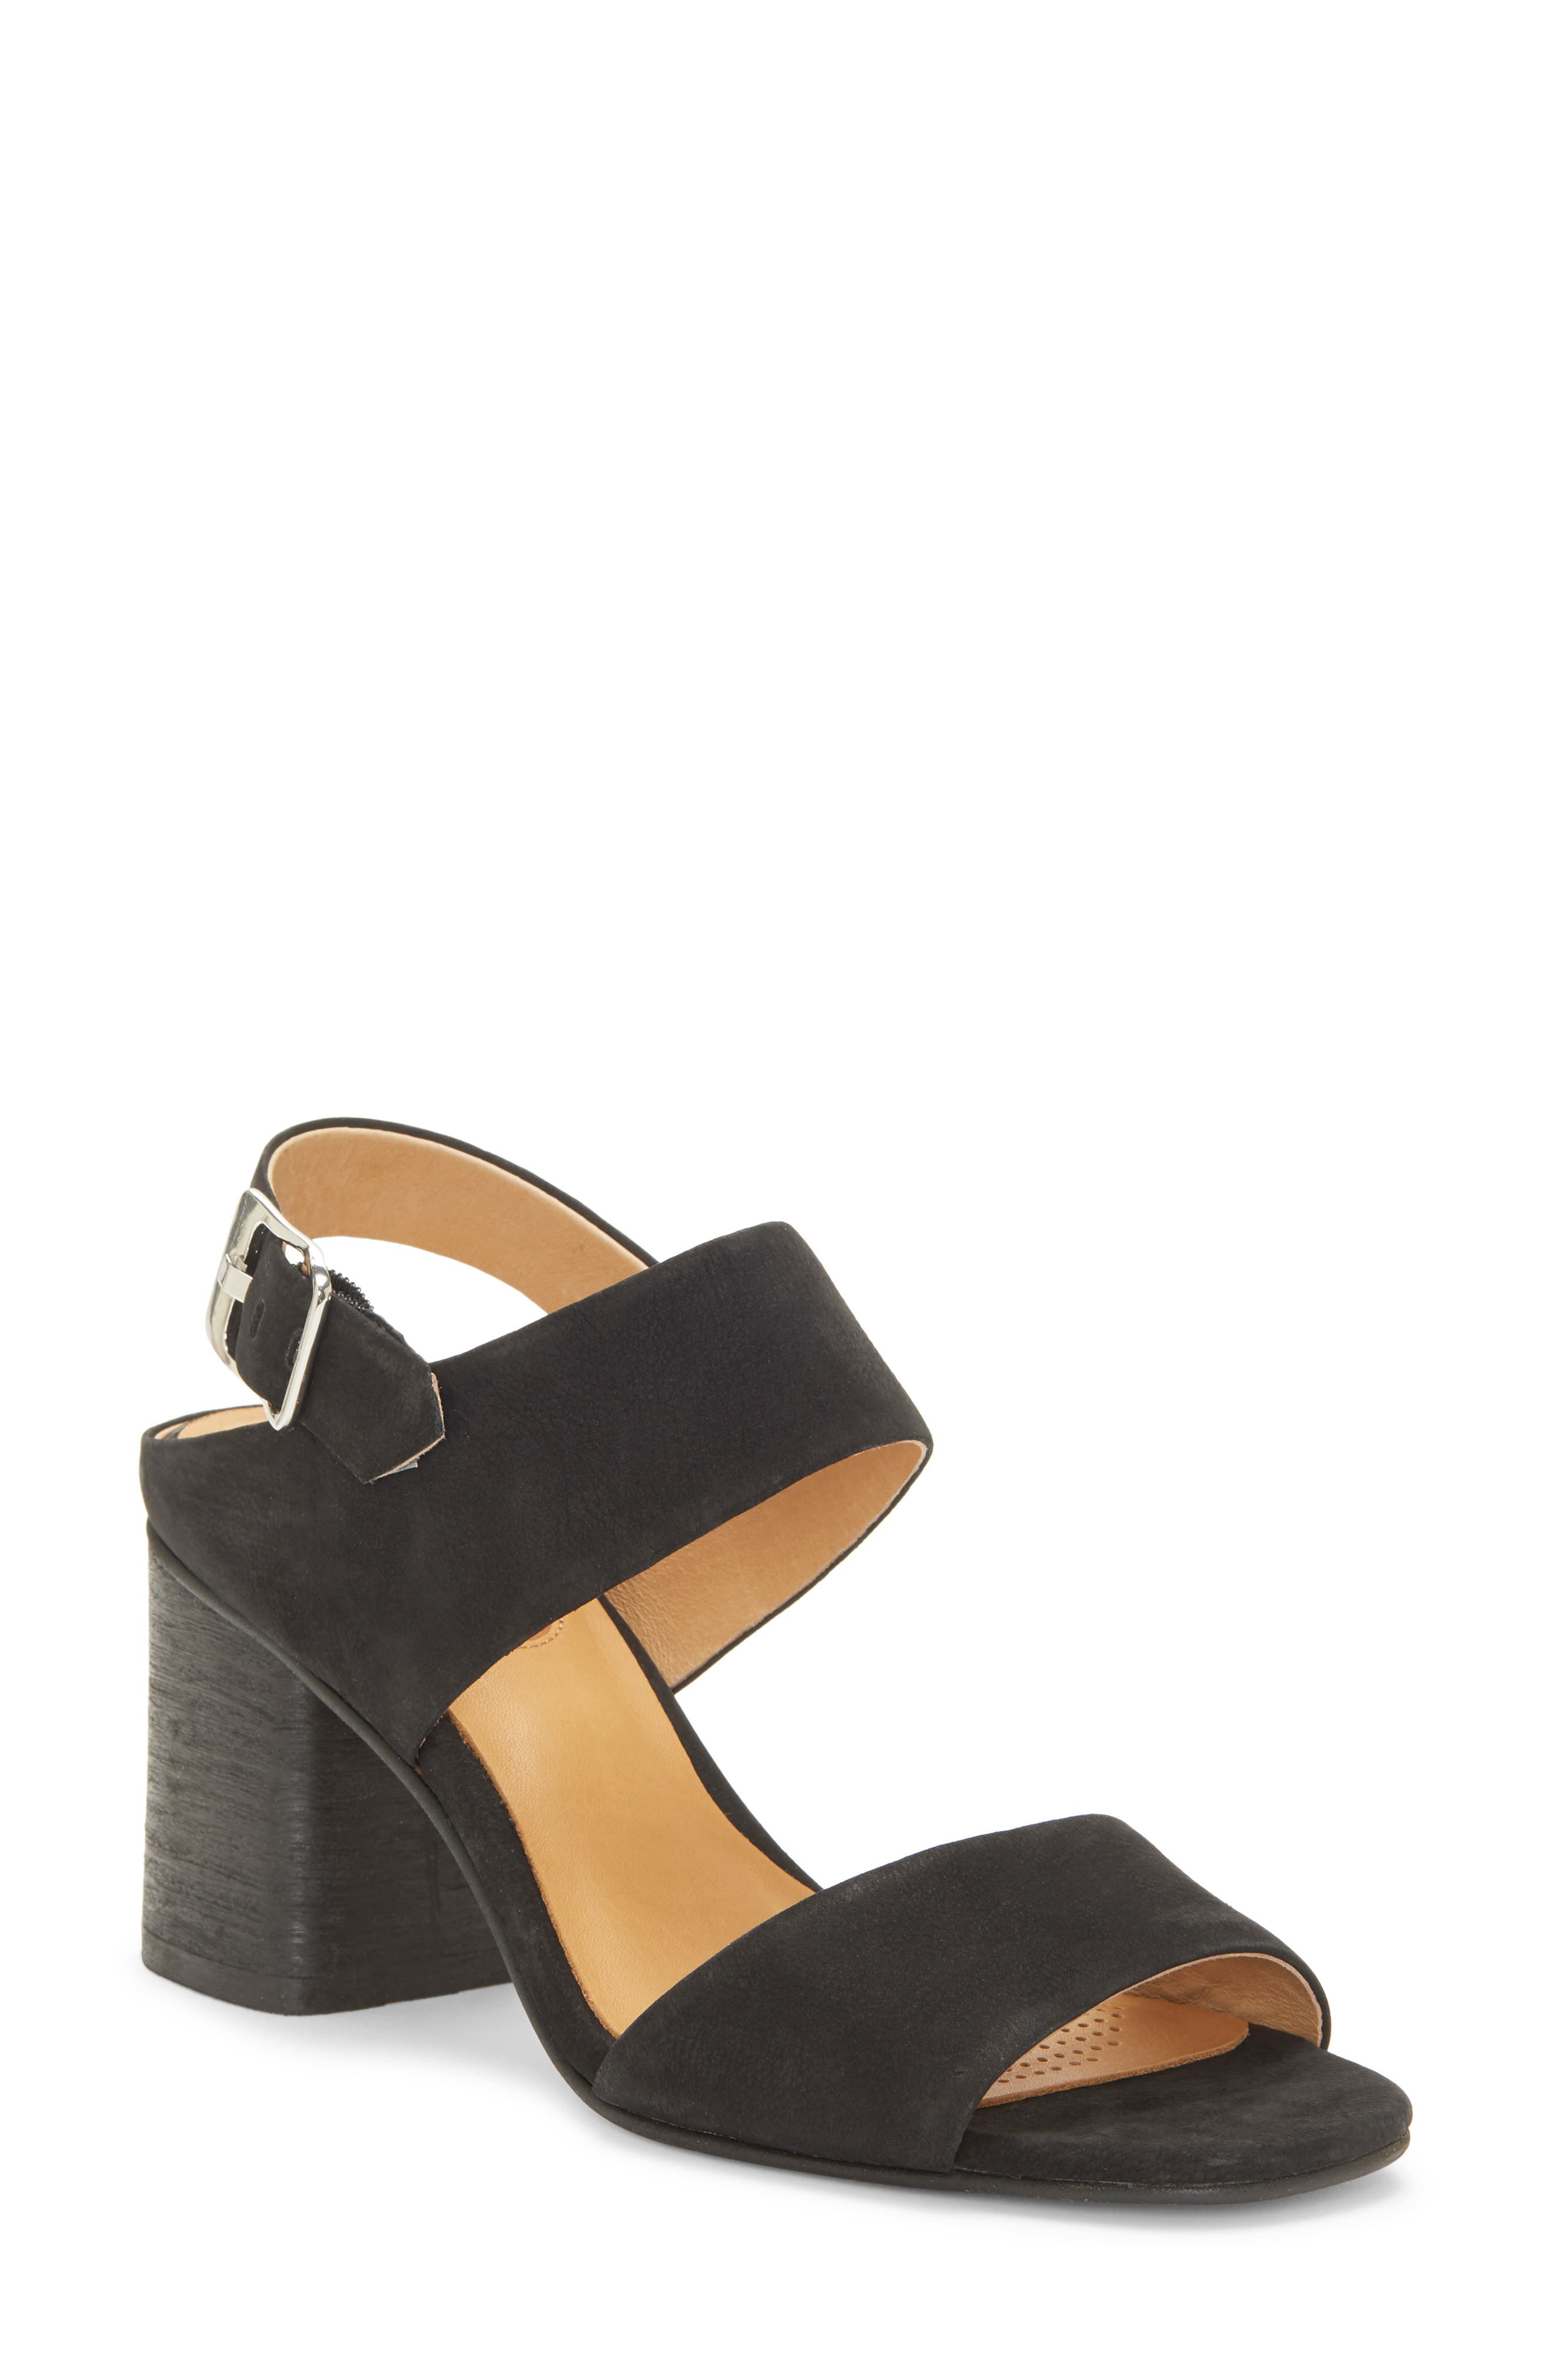 CC CORSO COMO<SUP>®</SUP> CC Corso Como Prysm Block Heel Sandal, Main, color, BLACK LEATHER